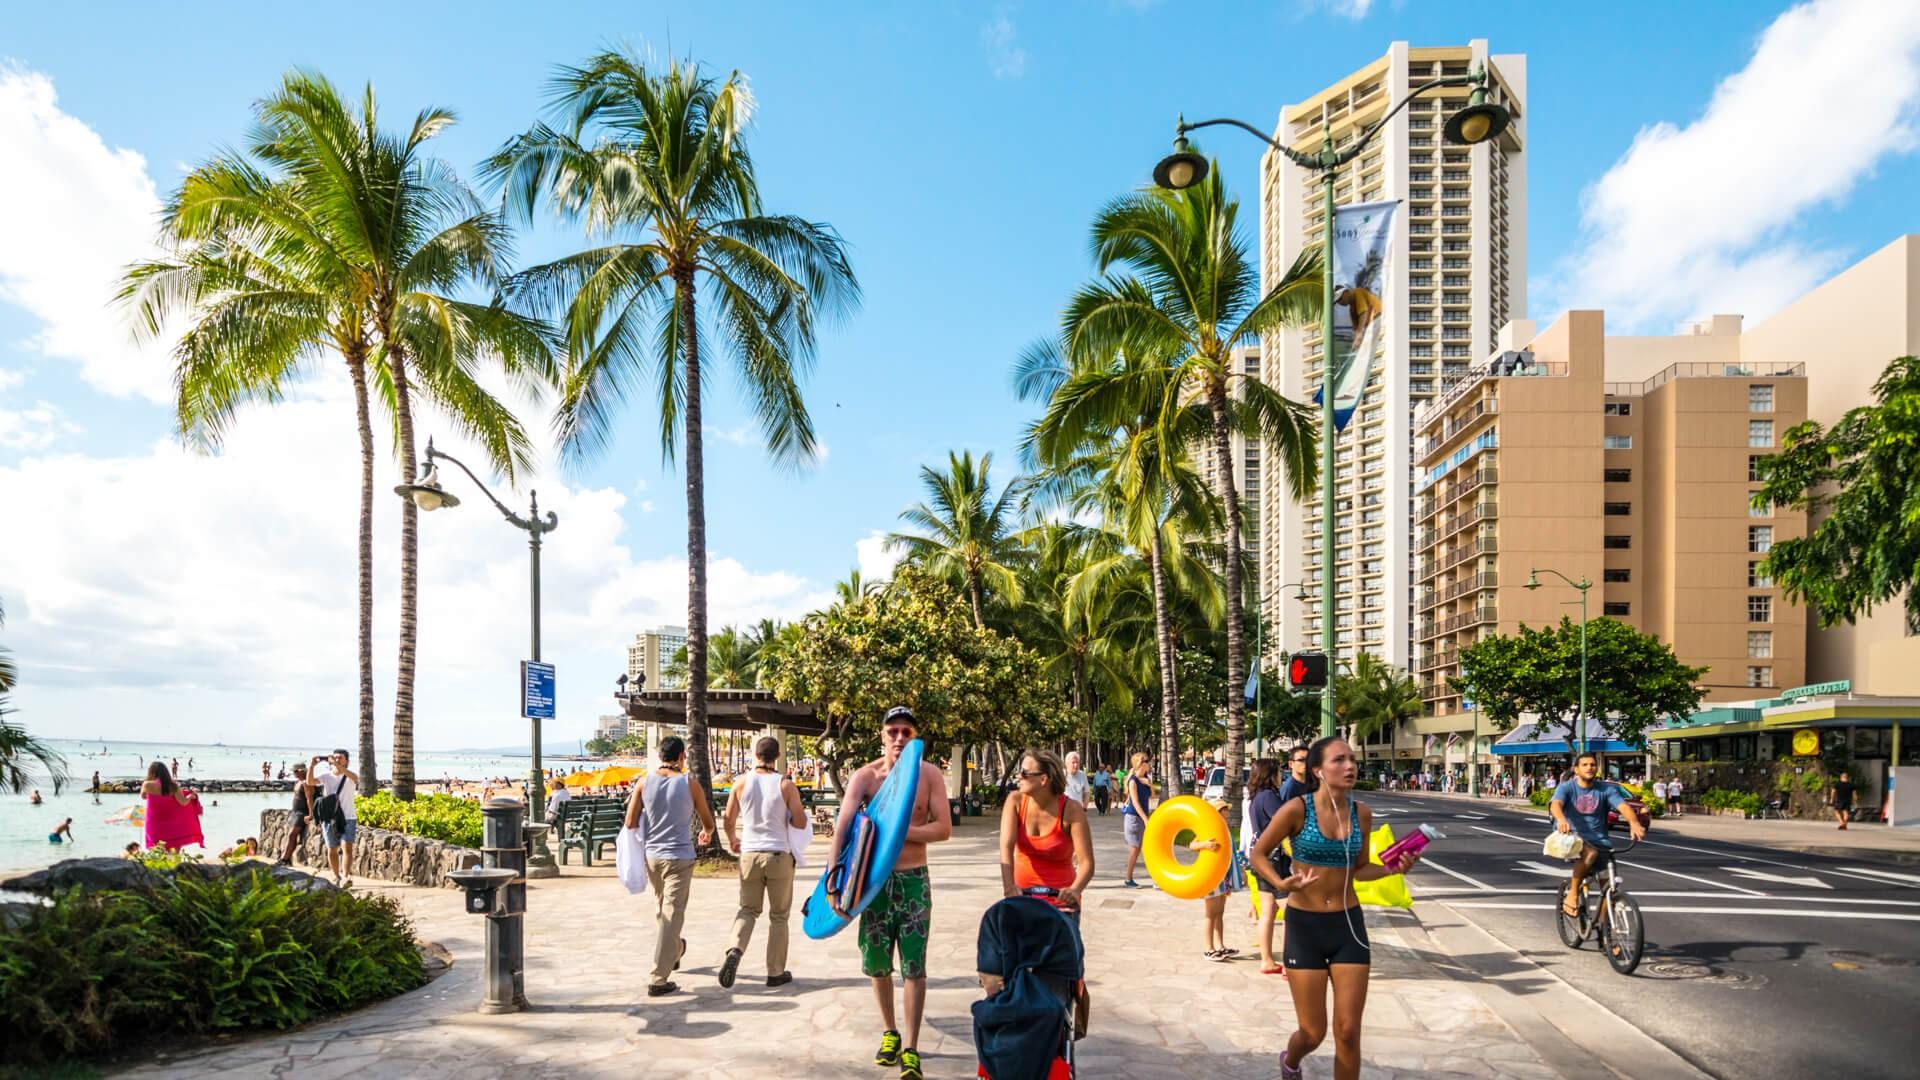 Waikiki, Hawaii, USA  - January 5, 2014: People jogging, cycling and walking along Waikiki Beach.